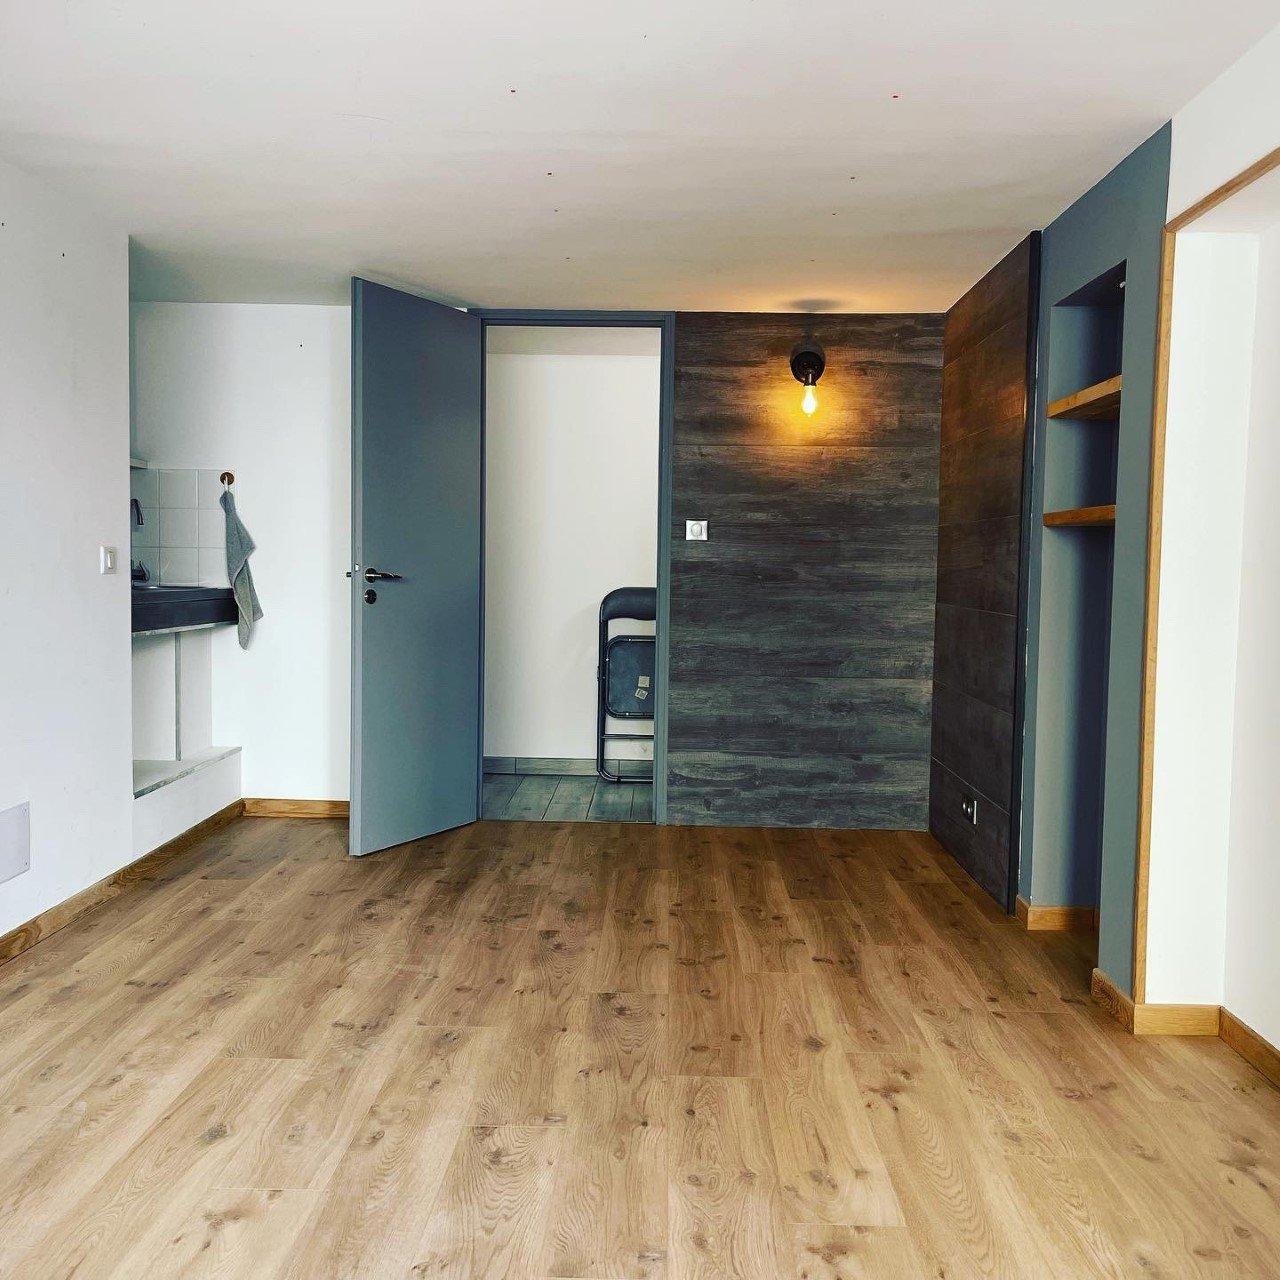 LOCATION PURE - 60 m² - NICE MAGNAN